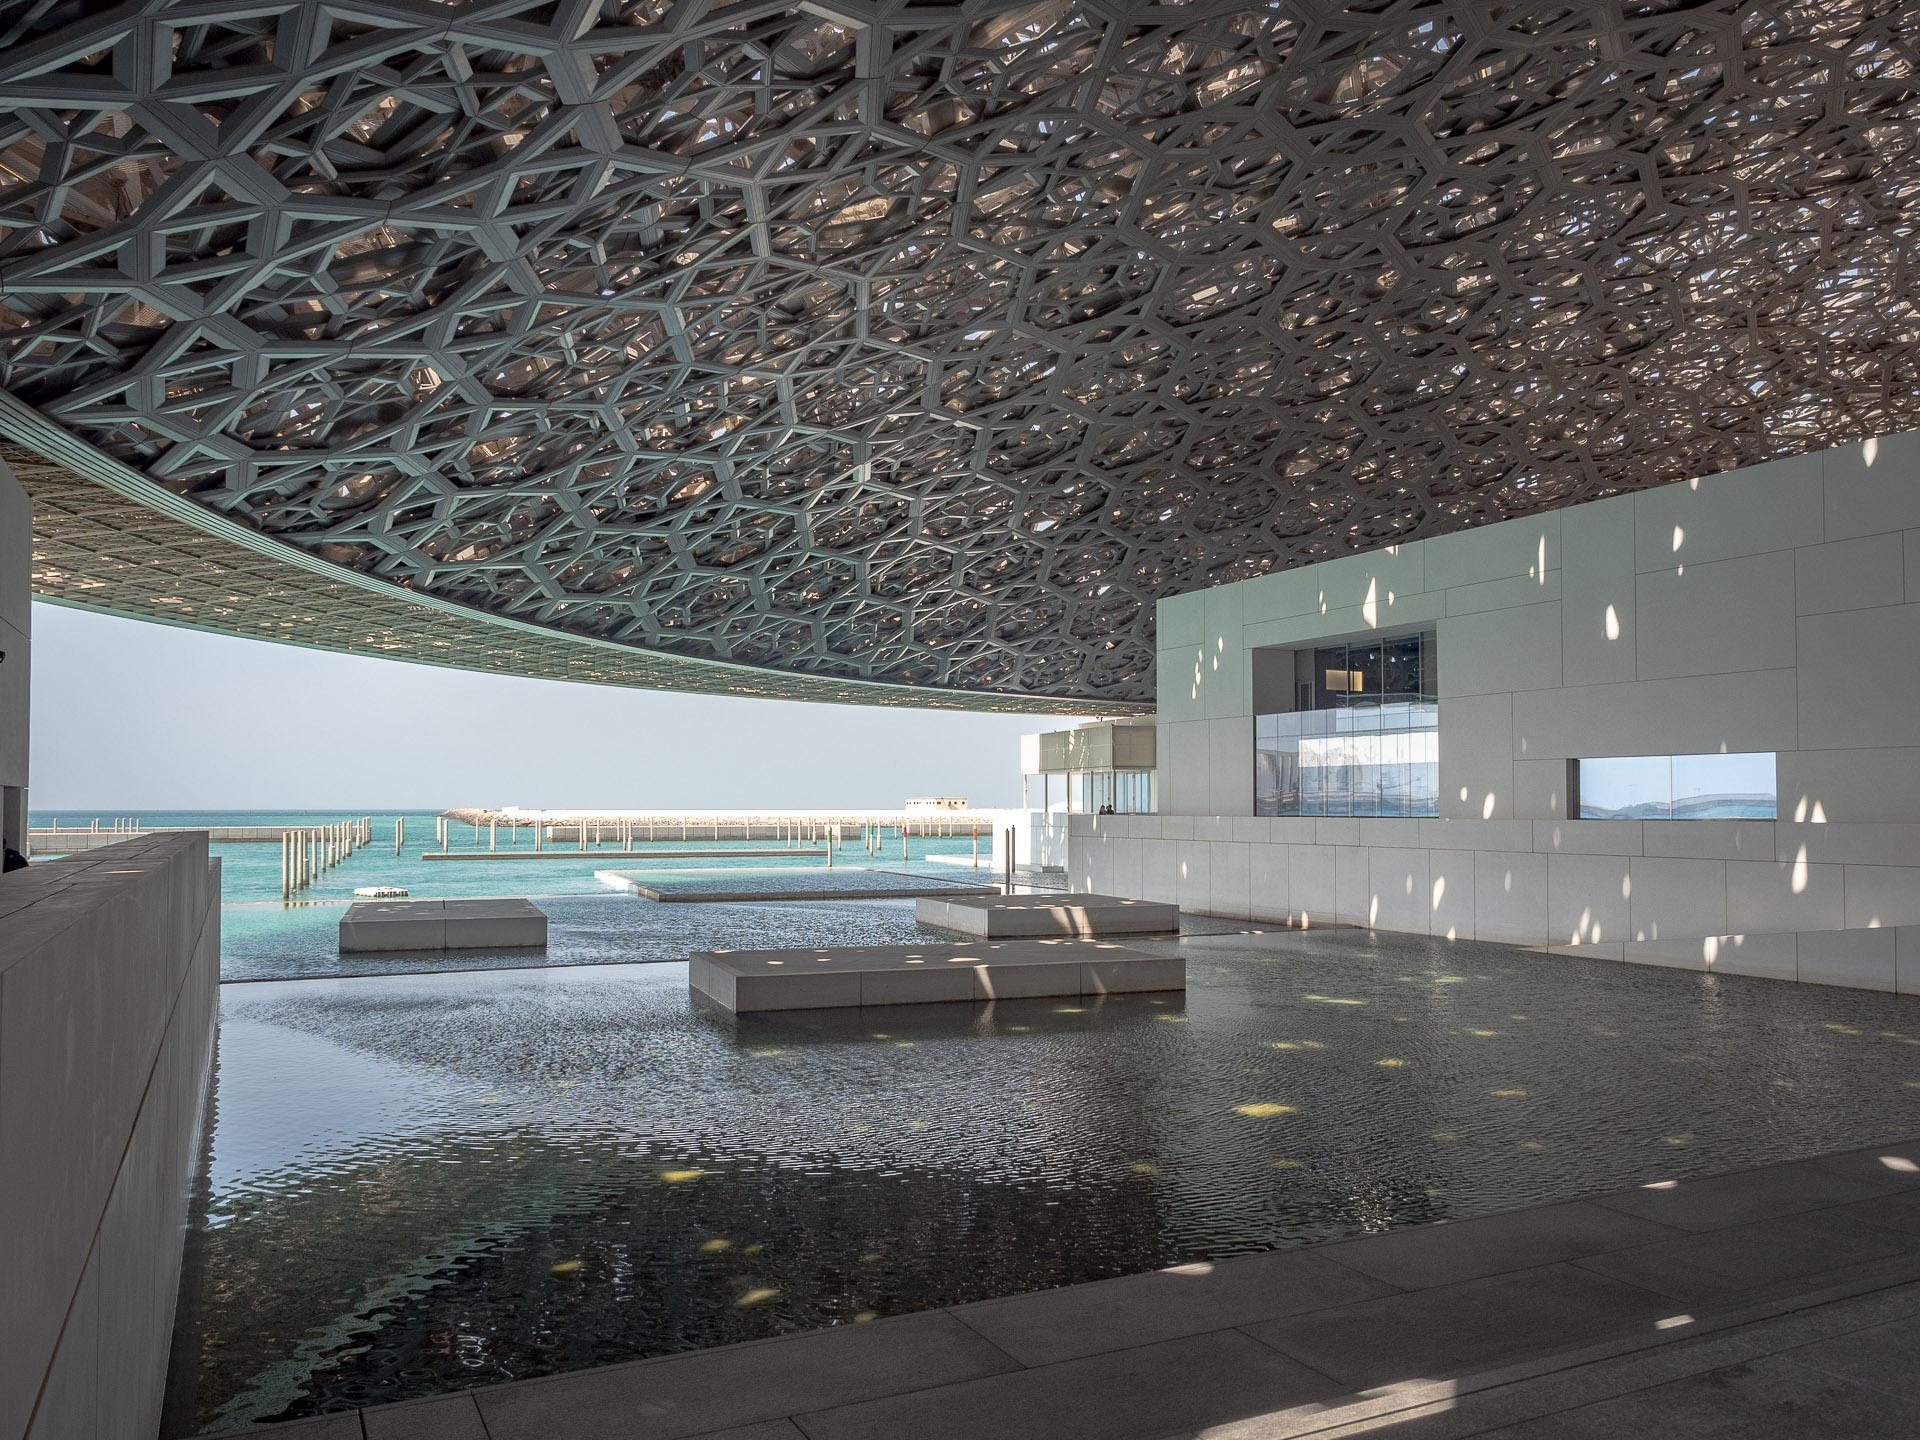 Architecture_Urban Shade_Jasmine Westerman_BGr_Honour